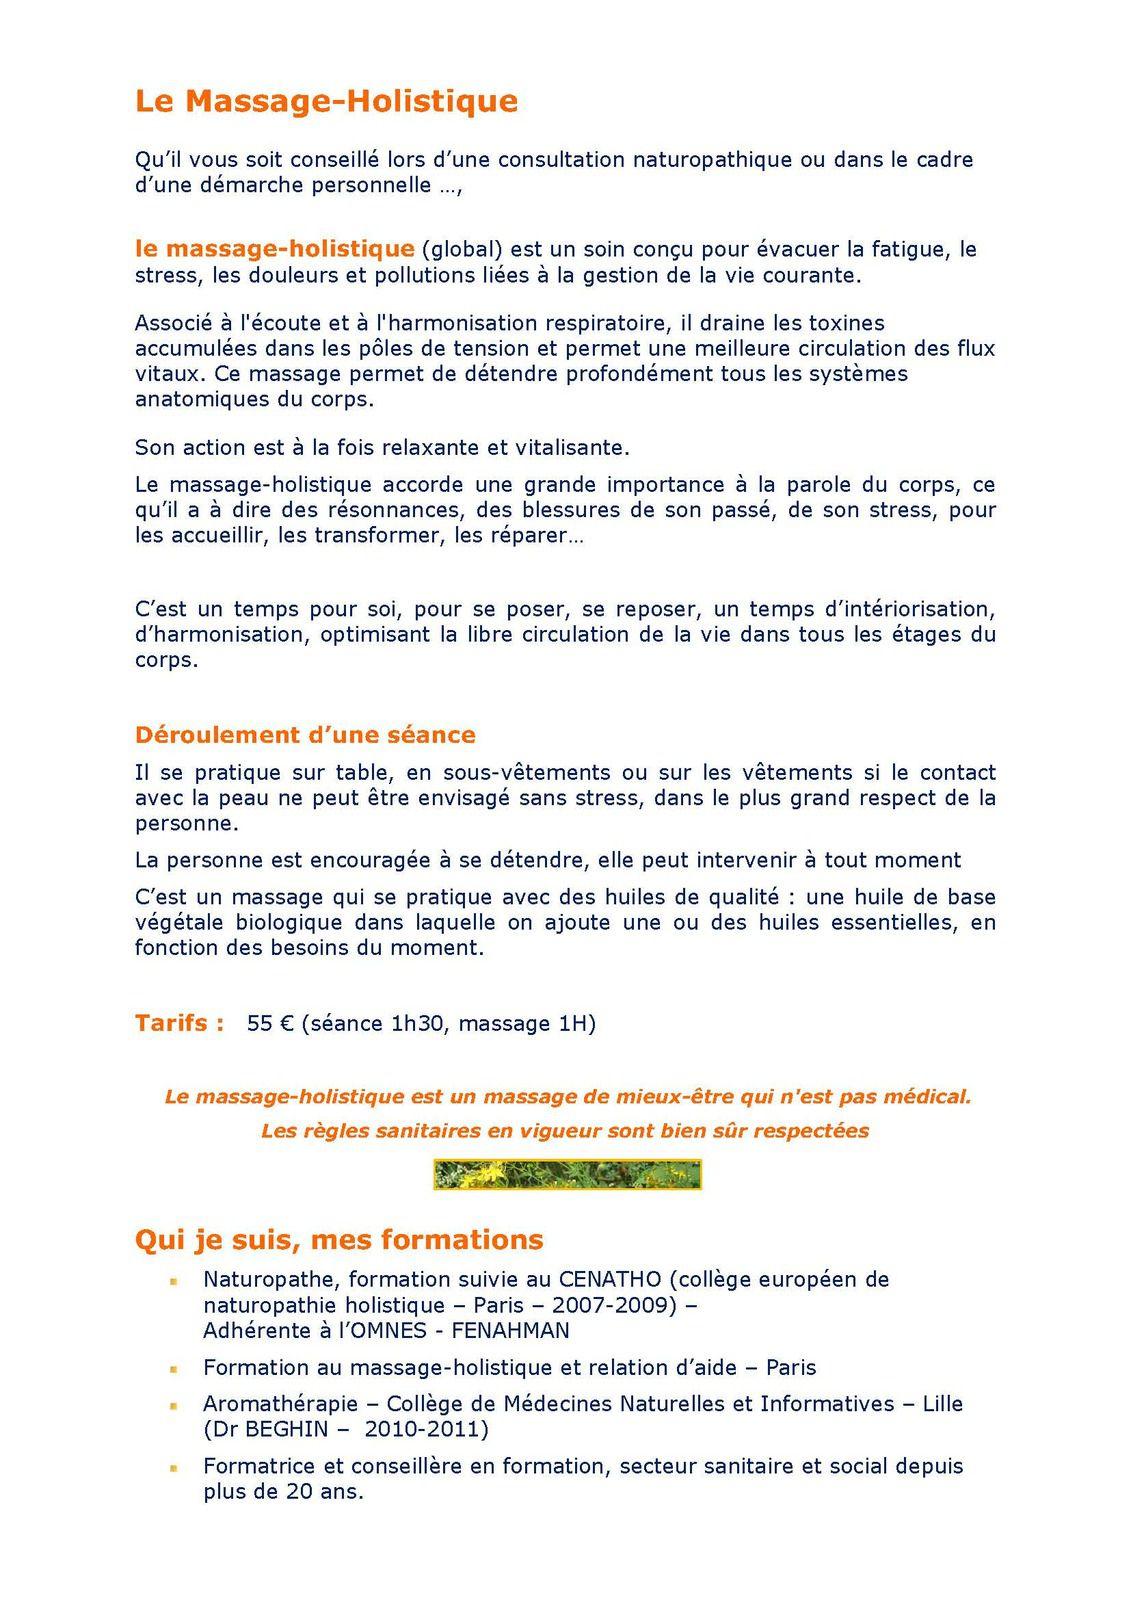 EMMANUELLE HUBLART/NATUROPATHE,PRATICIENNE DE SANT'E